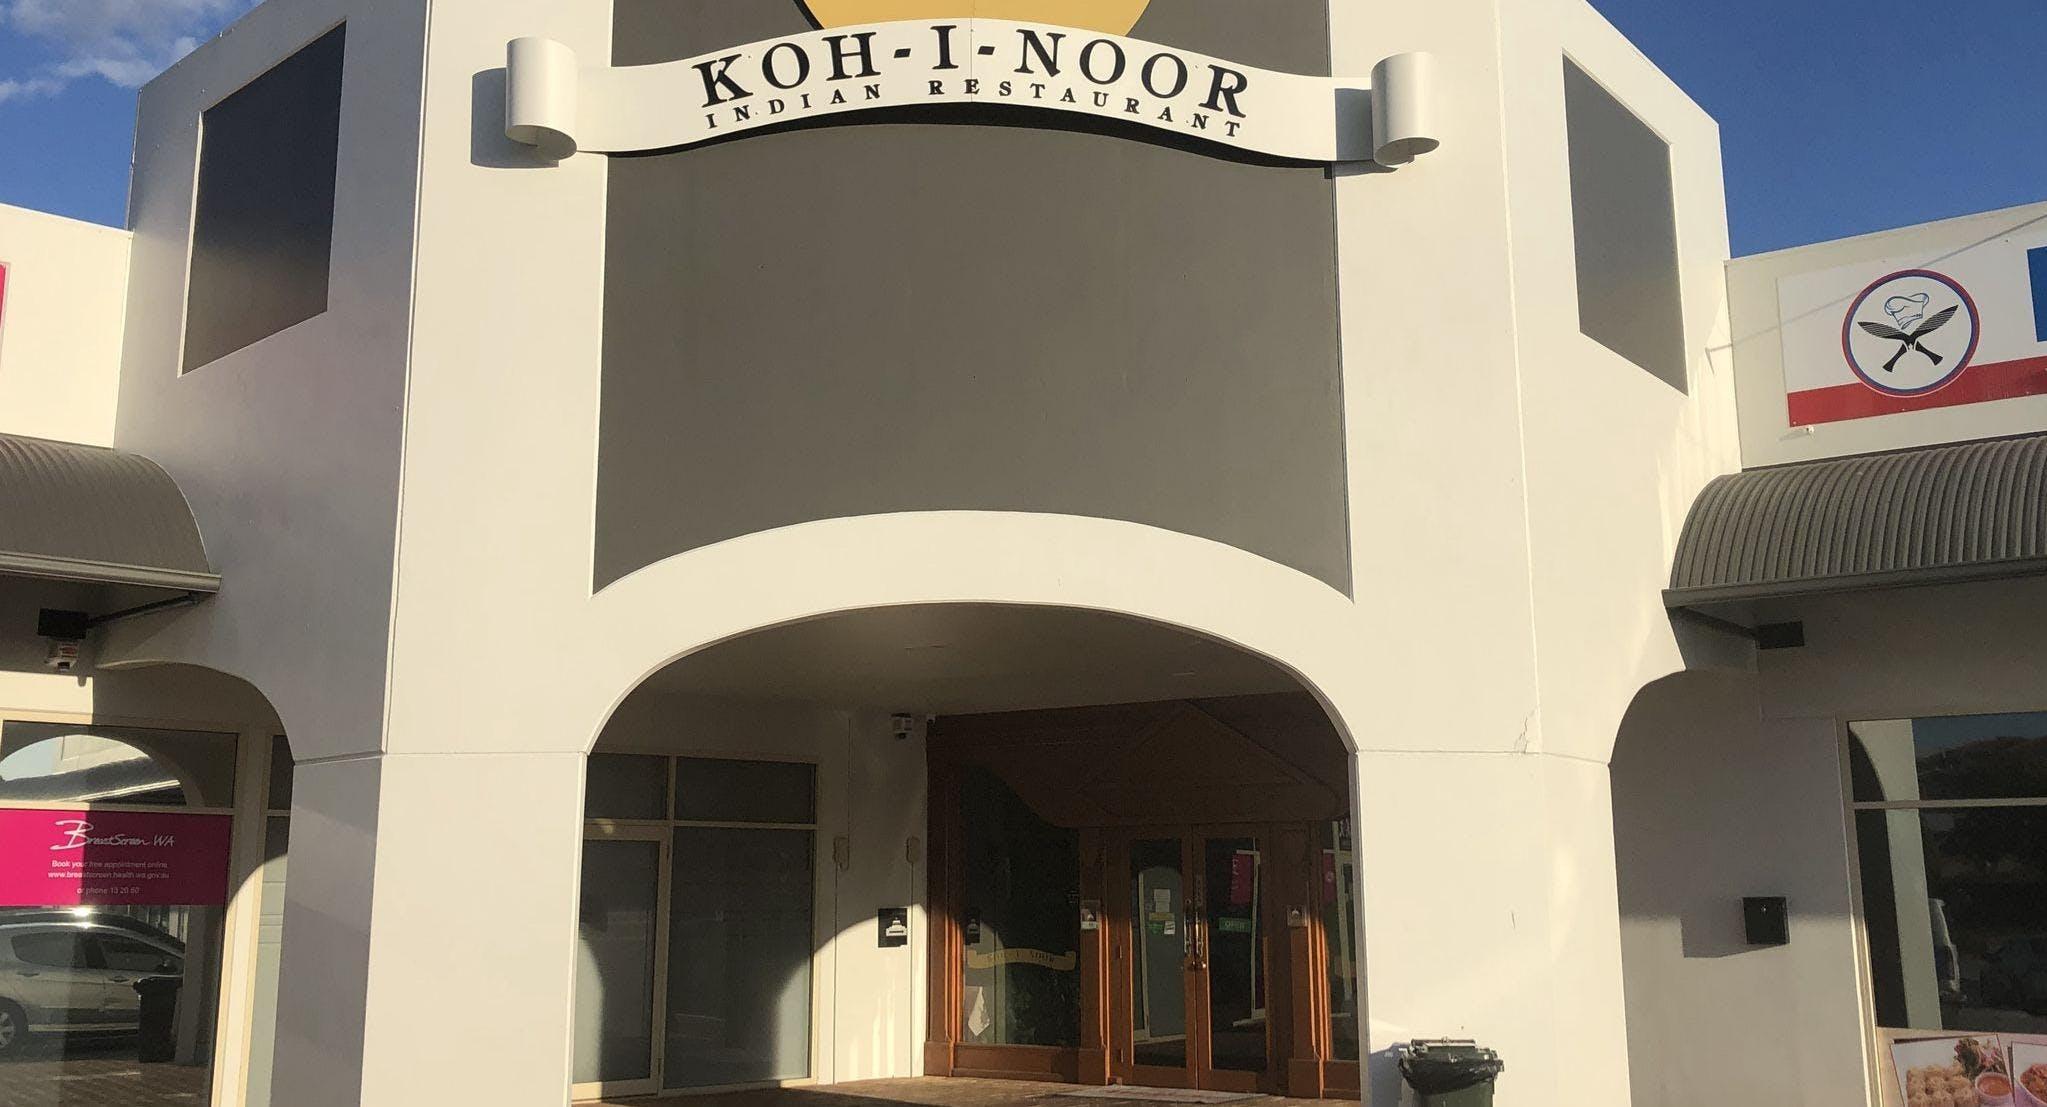 Koh-I-Noor Indian Restaurant